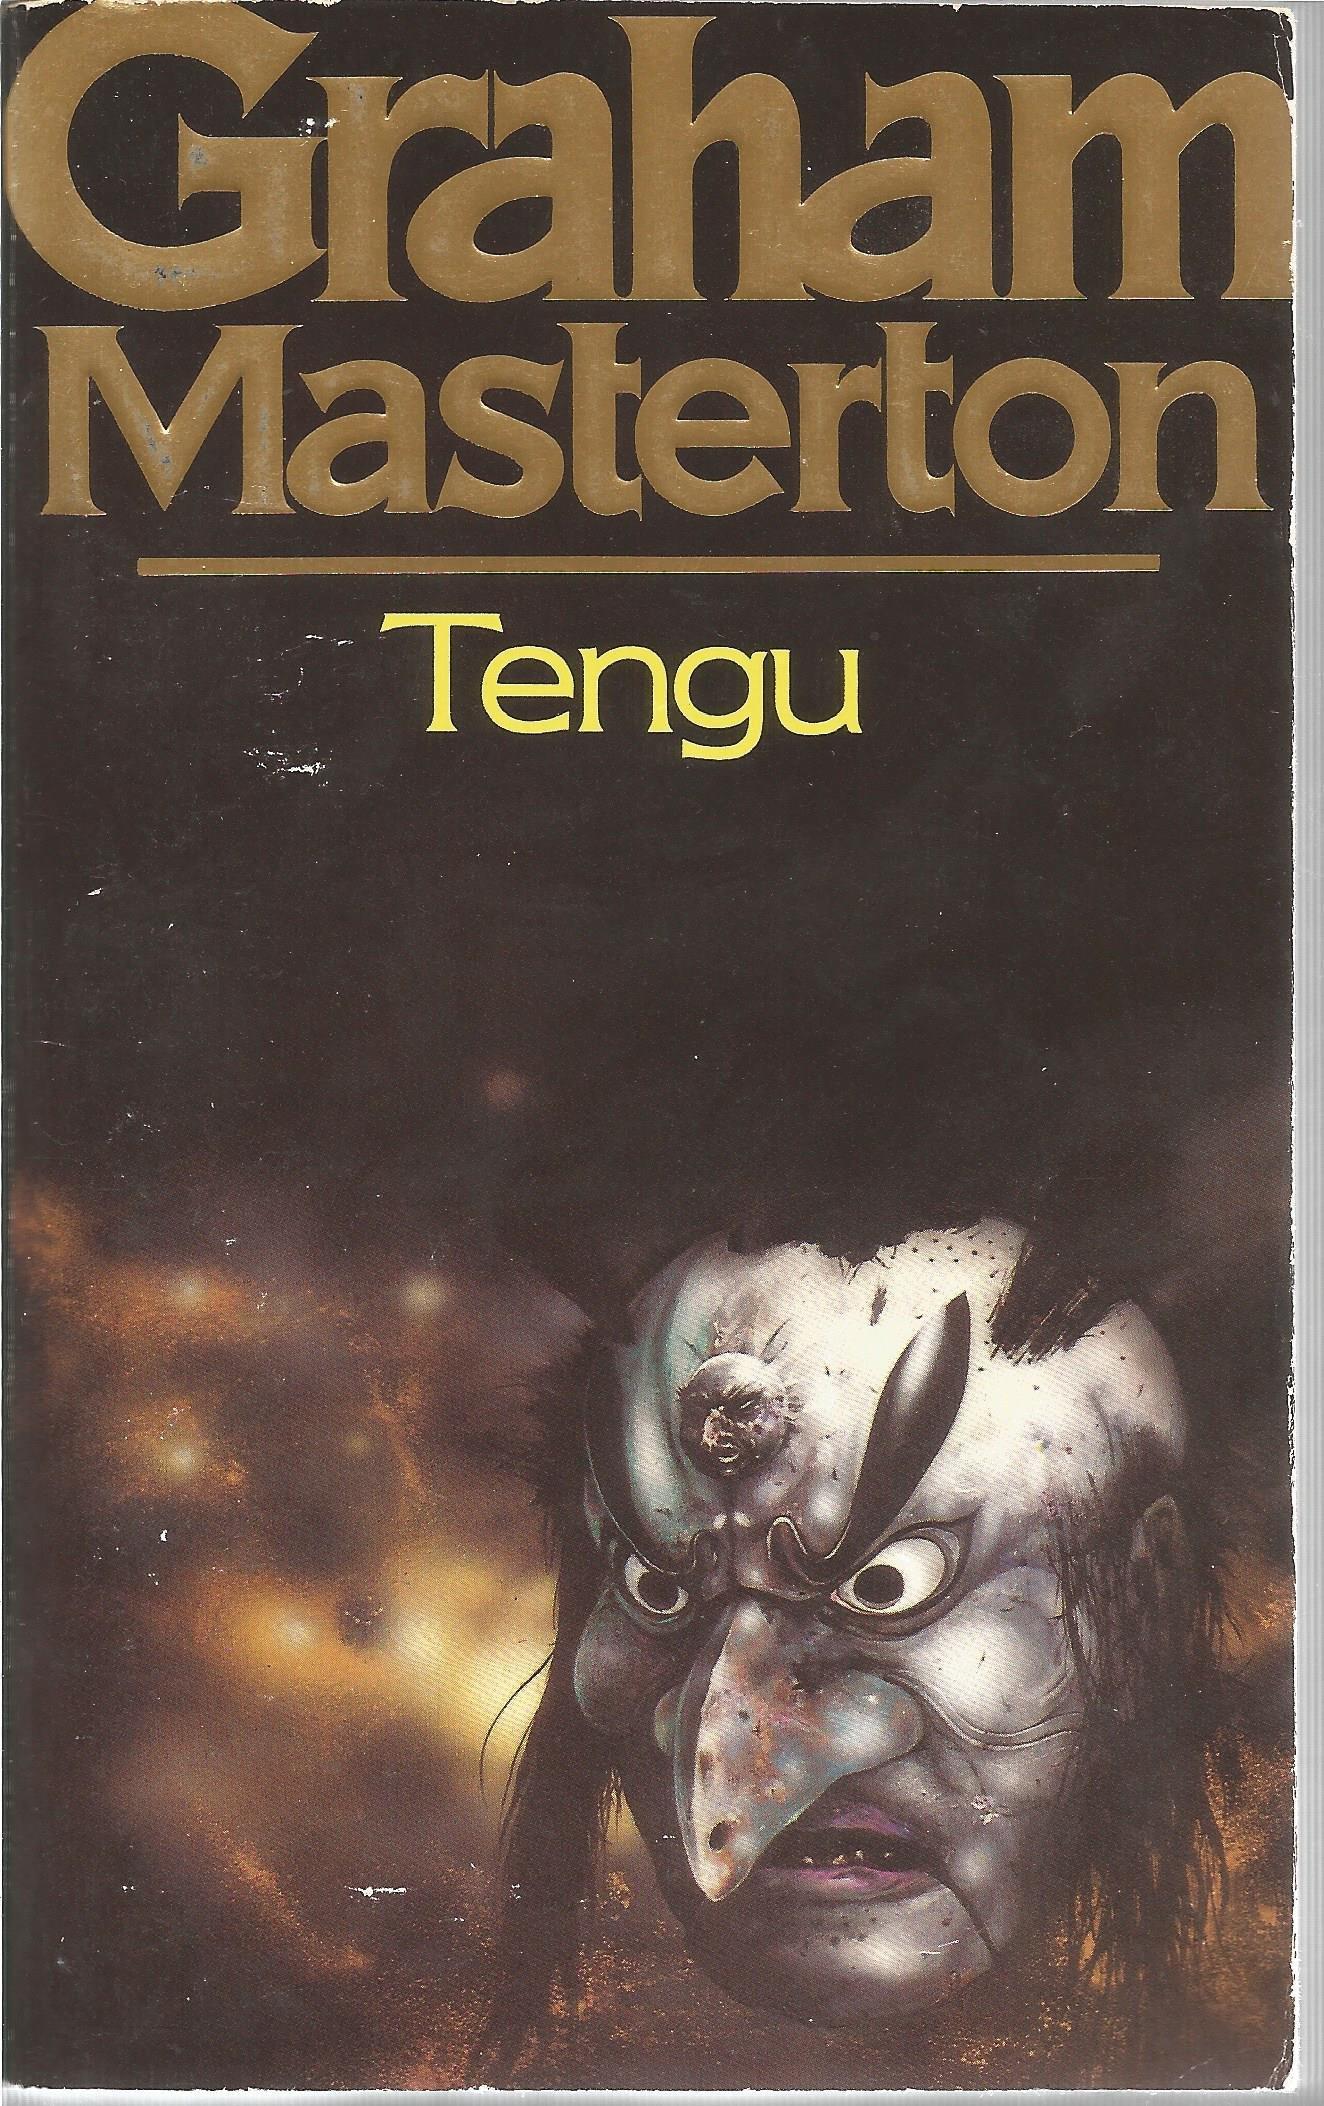 Graham Masterton signed book Tengu. Signed on inside